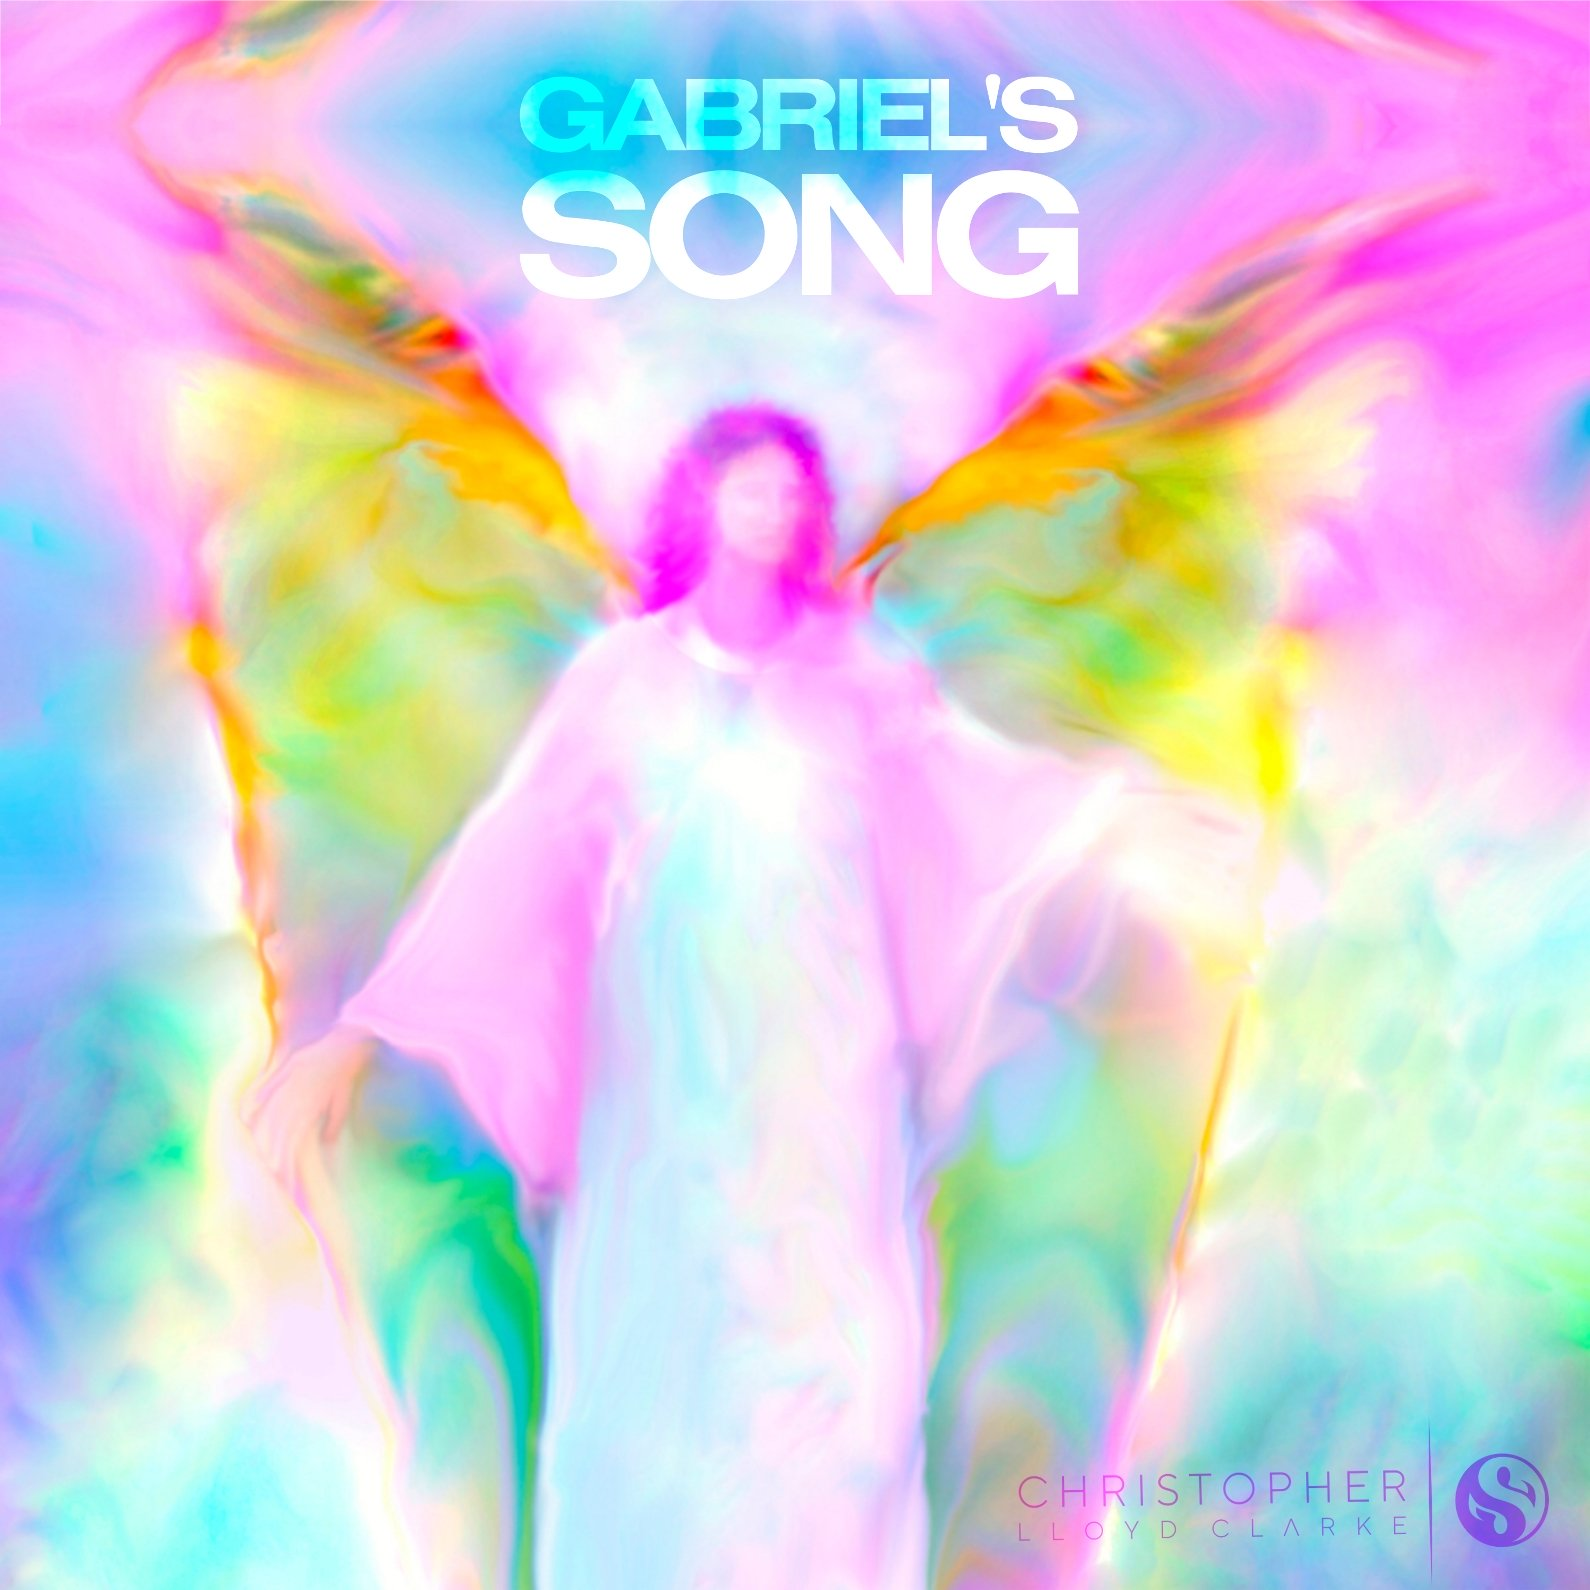 Gabriel's Song - Meditation Music by Christopher Lloyd Clarke